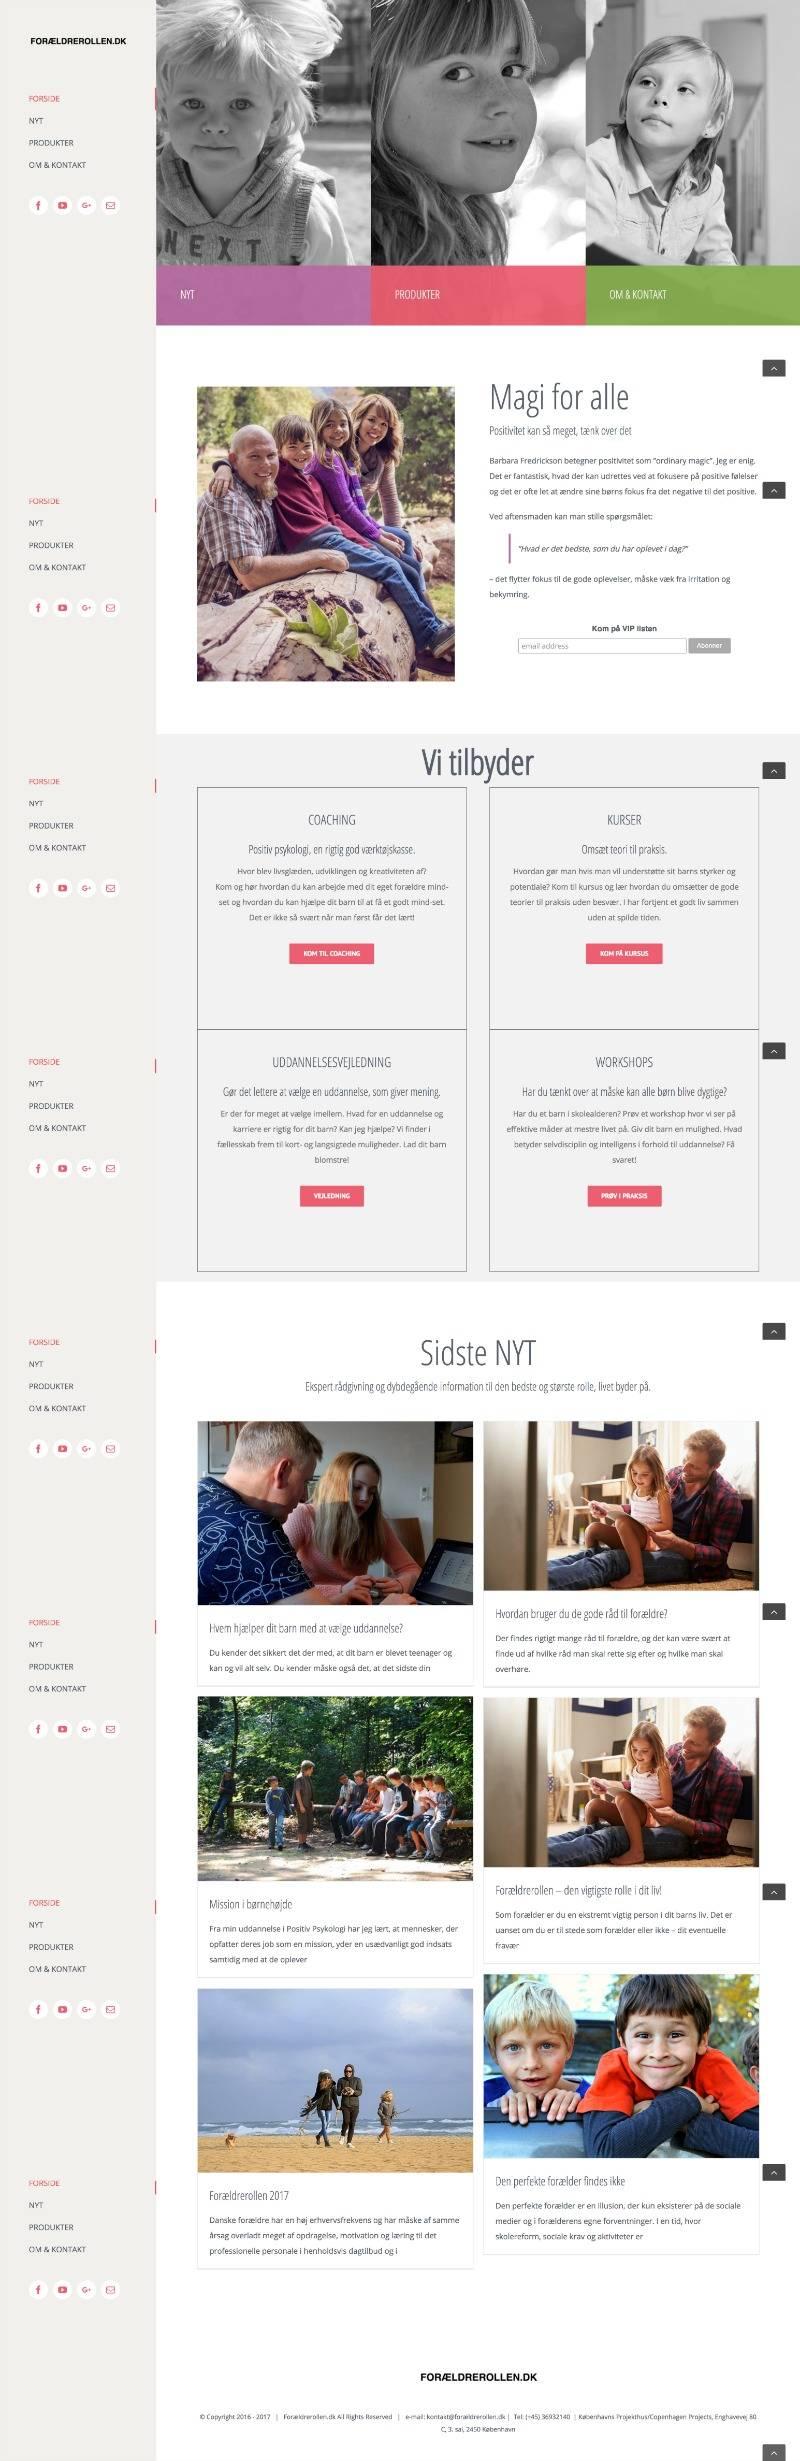 forældrerollen.dk, produced by webmom.eu